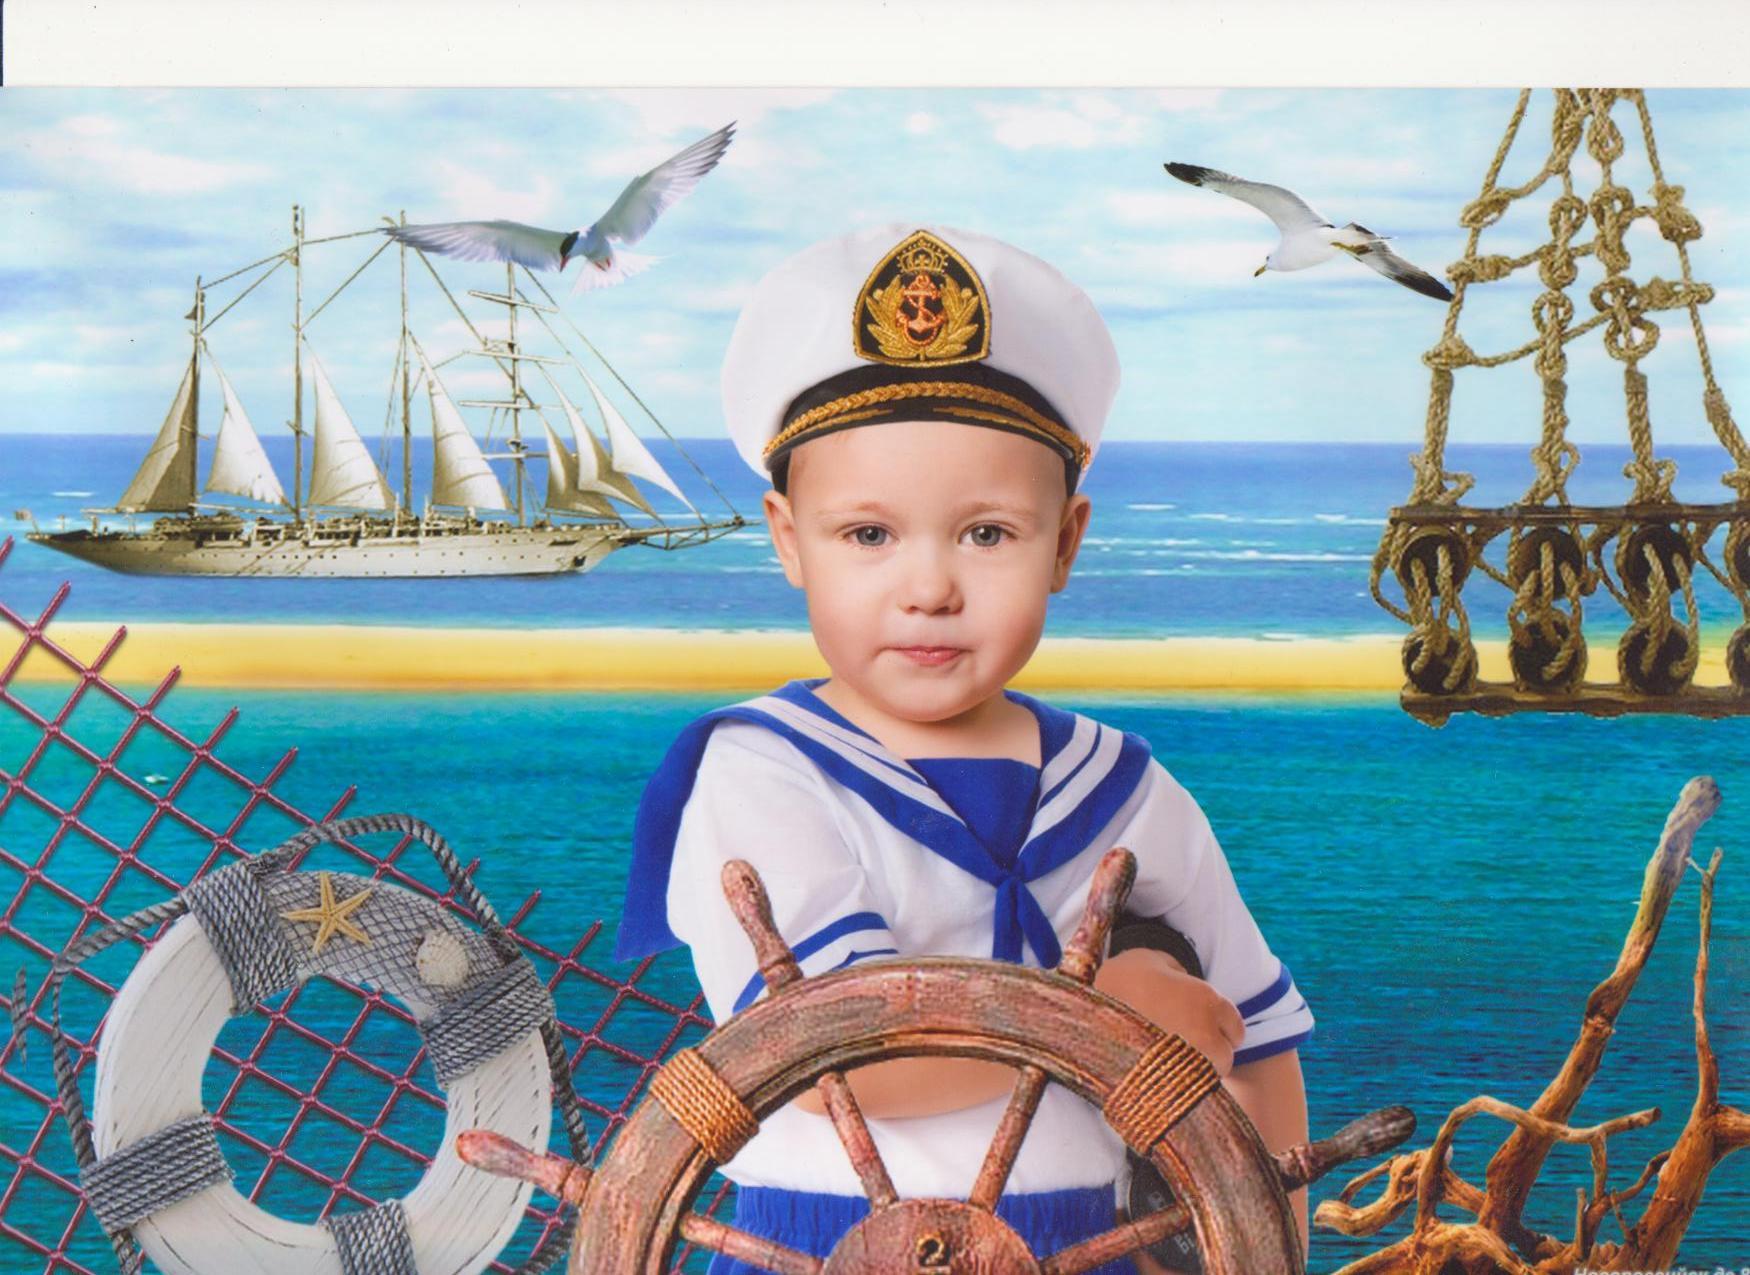 Дети в морских костюмах фото